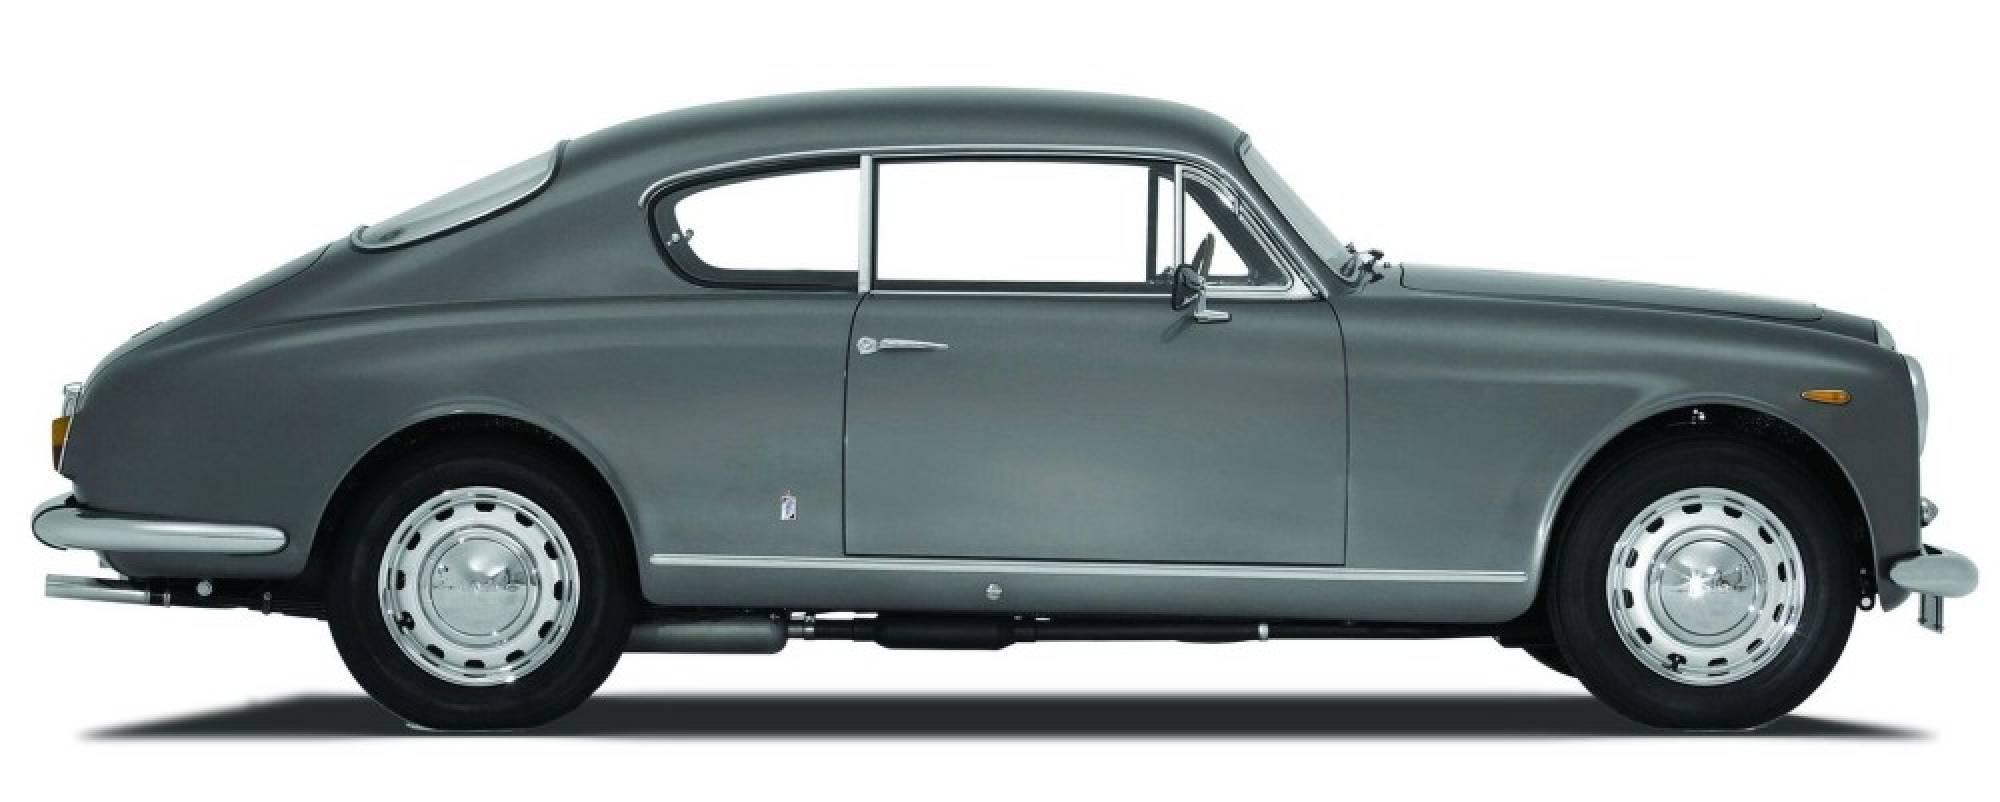 Lancia Aurelia 1956